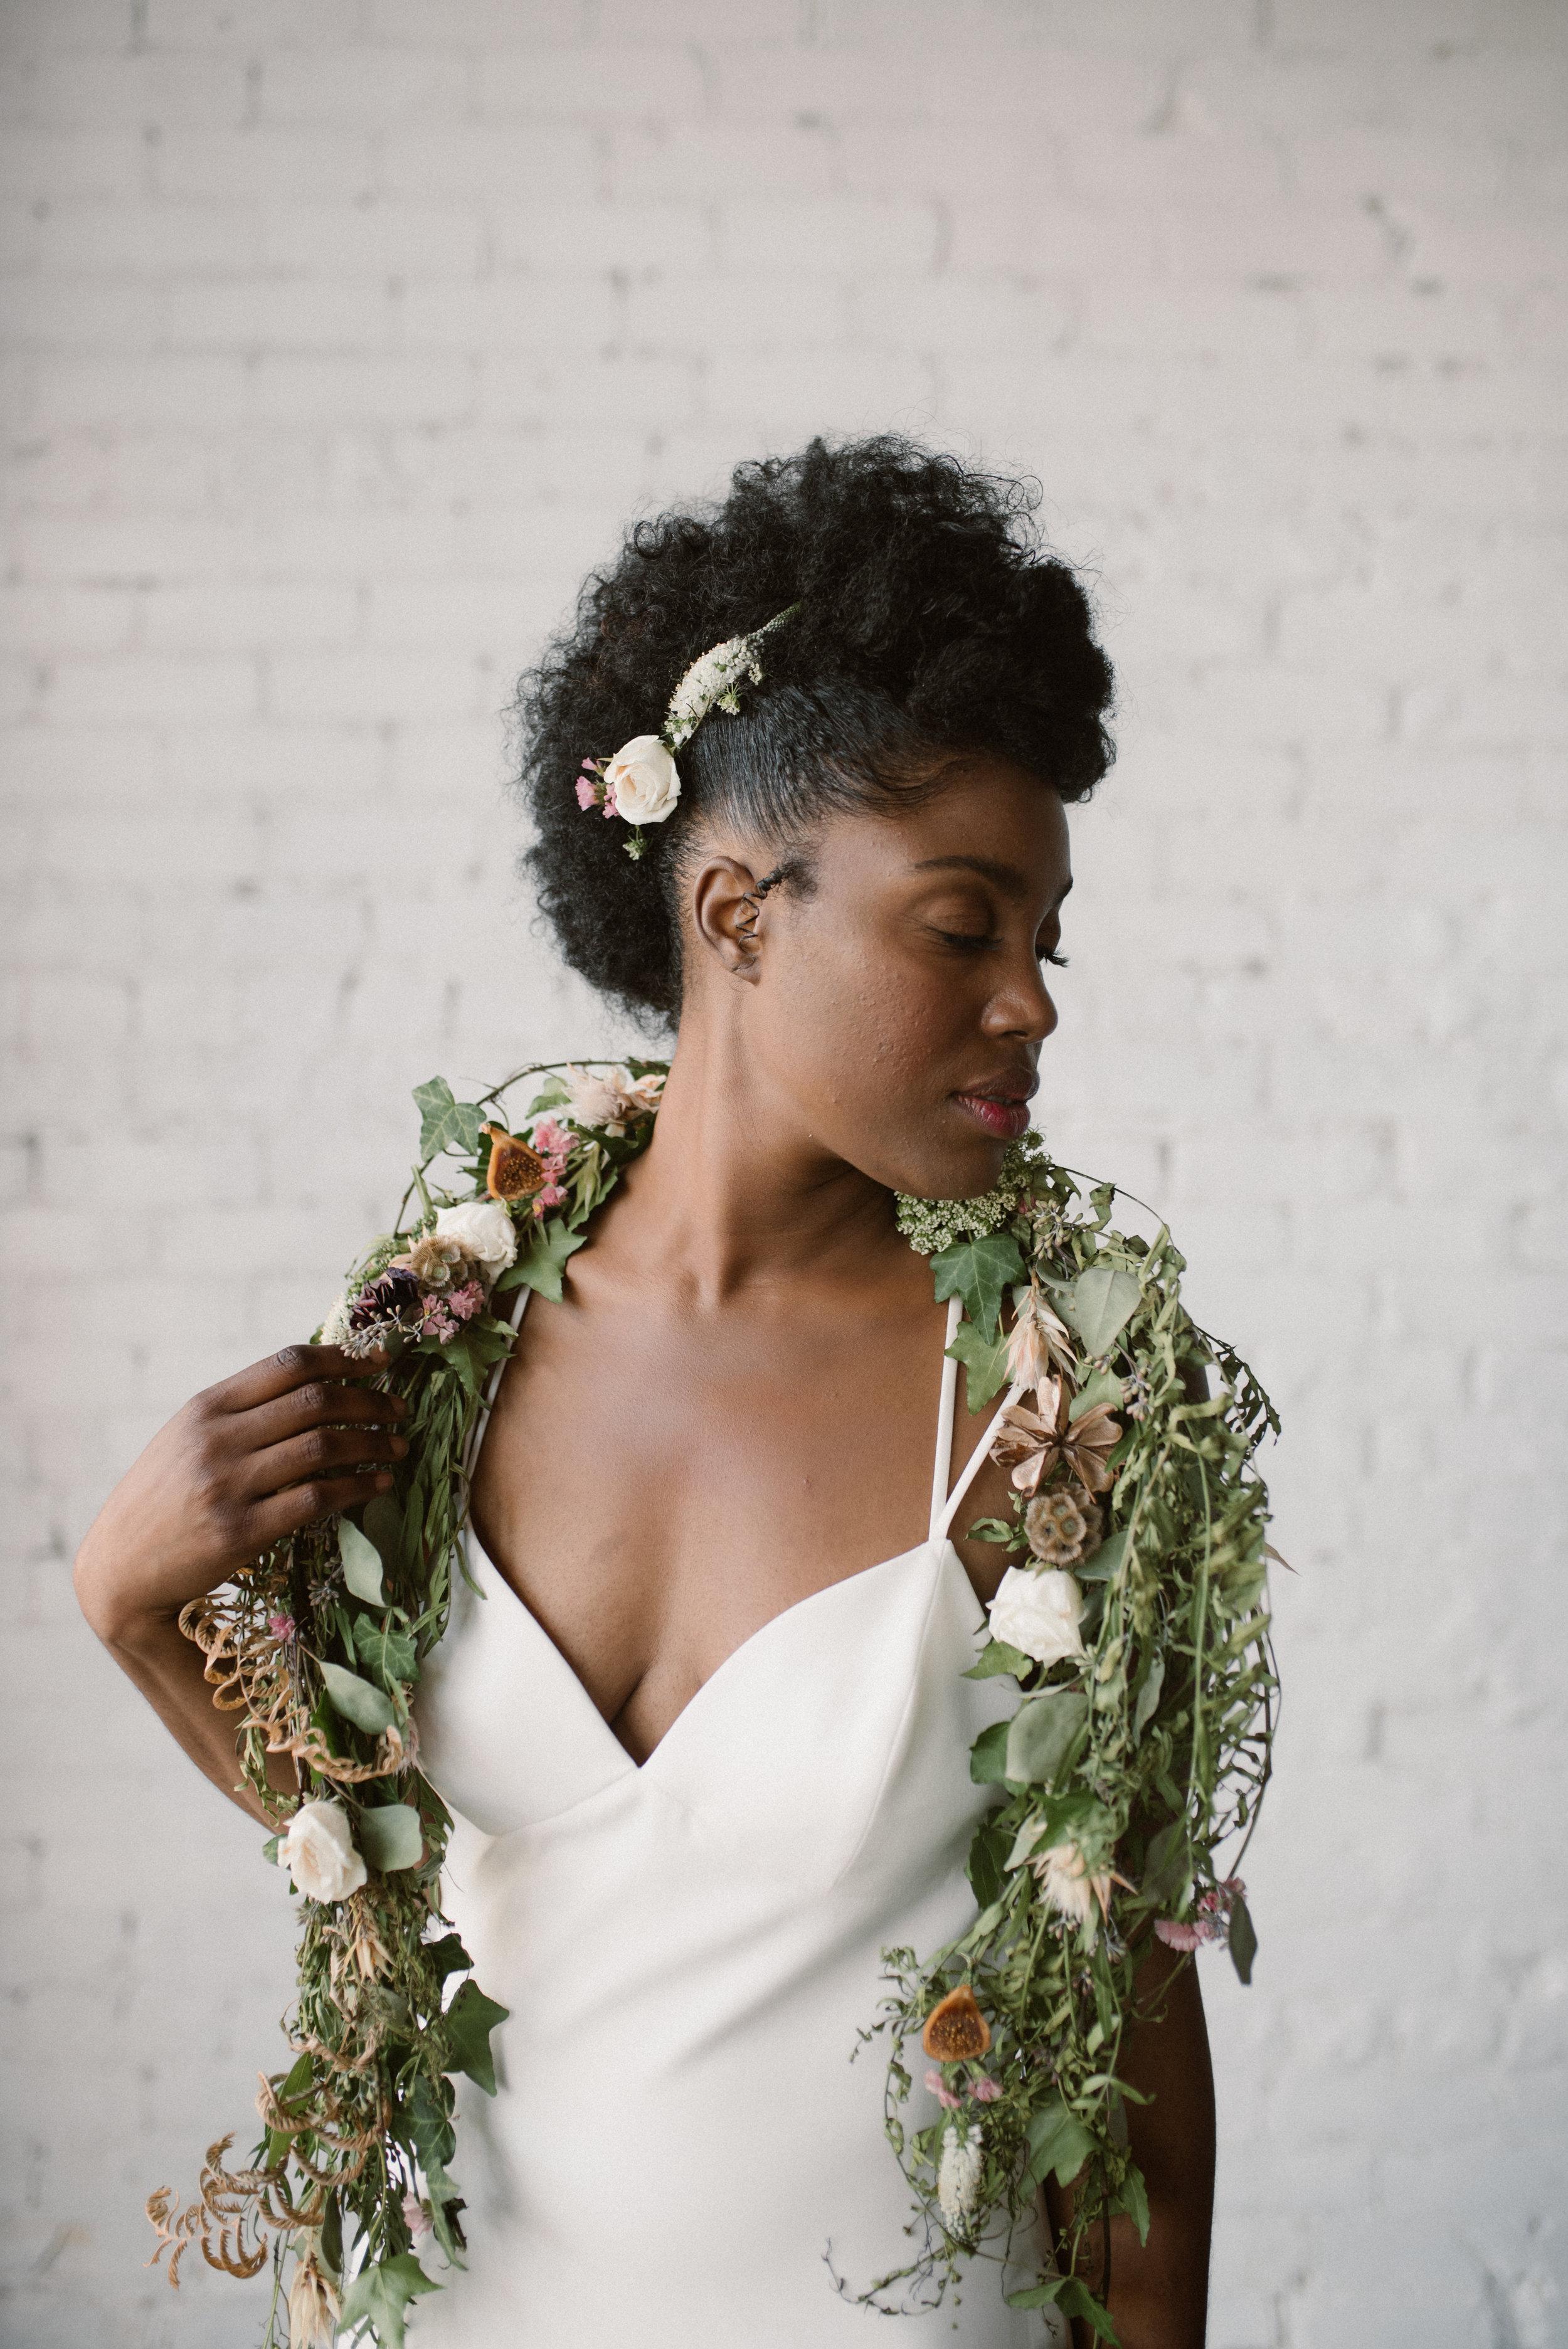 haus-820-minimal-editorial-wedding-styled-shoot-77.jpg